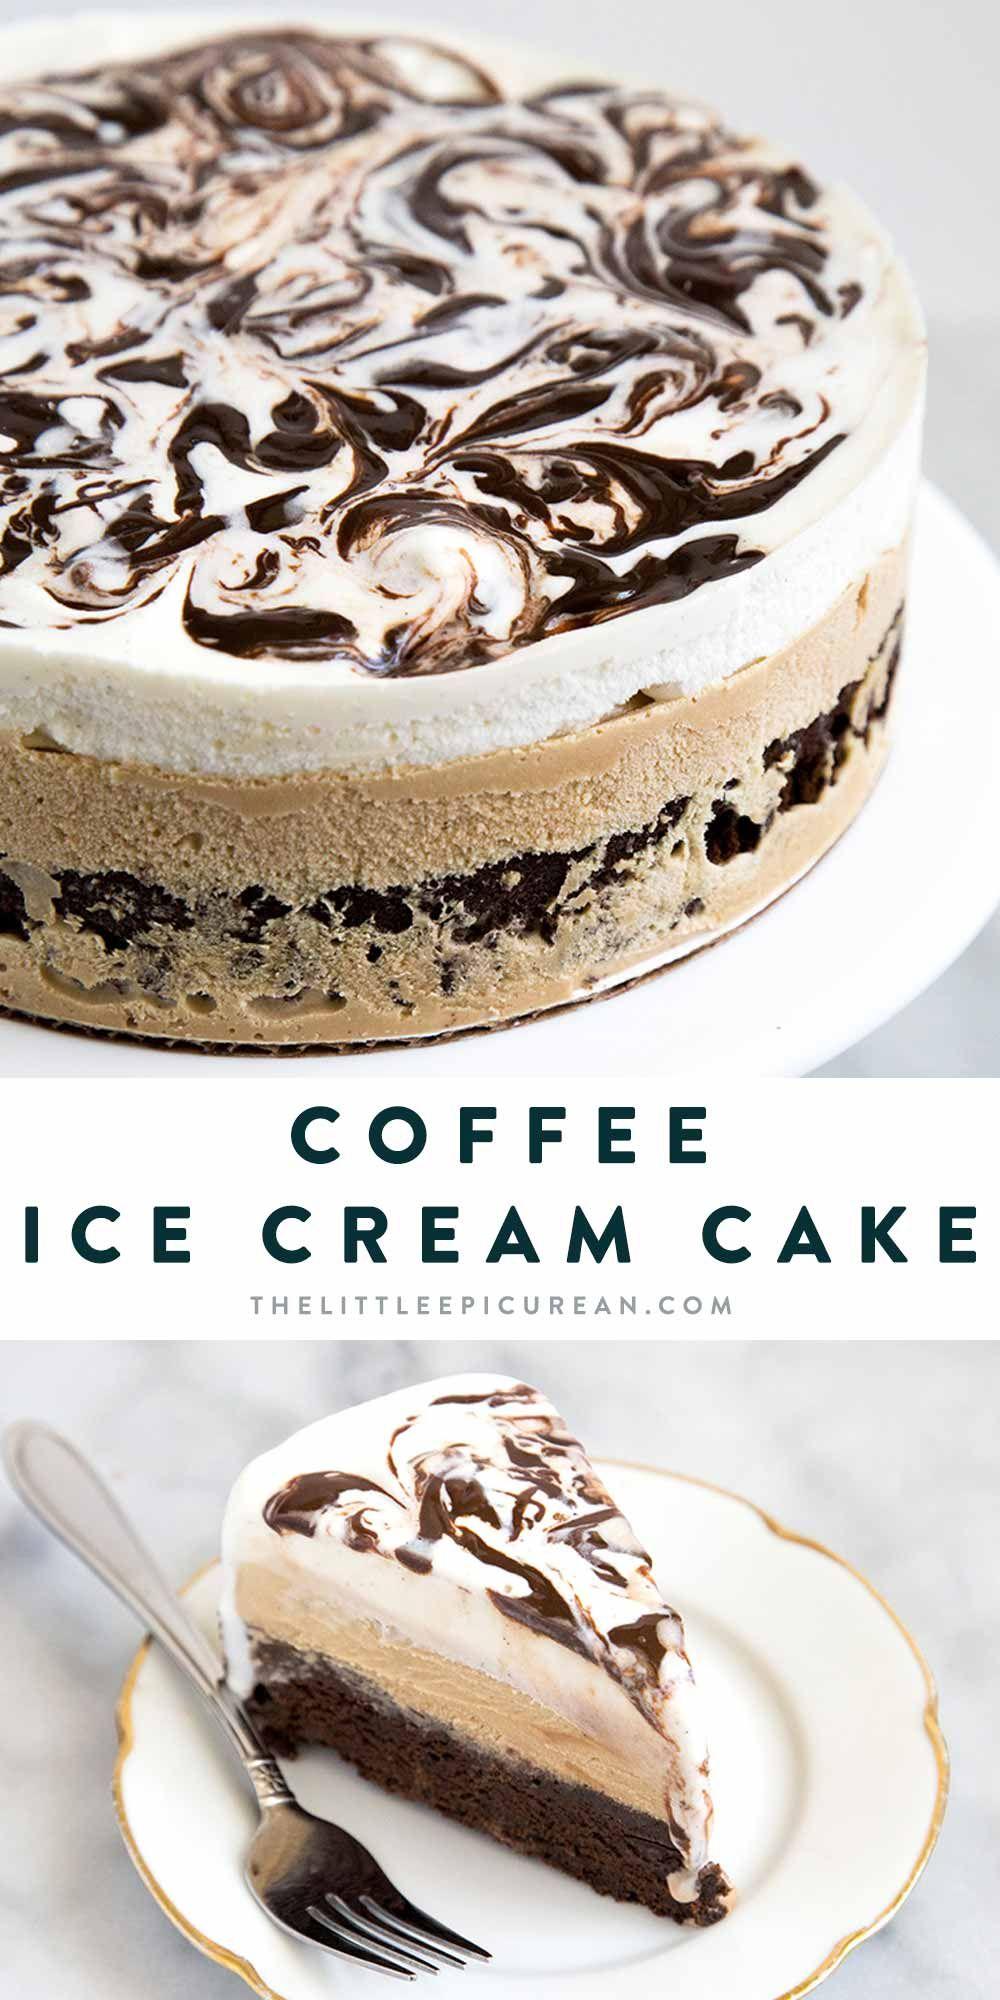 Coffee Ice Cream Cake The Little Epicurean Recipe In 2020 Desserts Ice Cream Cake Recipe Coffee Ice Cream Cake